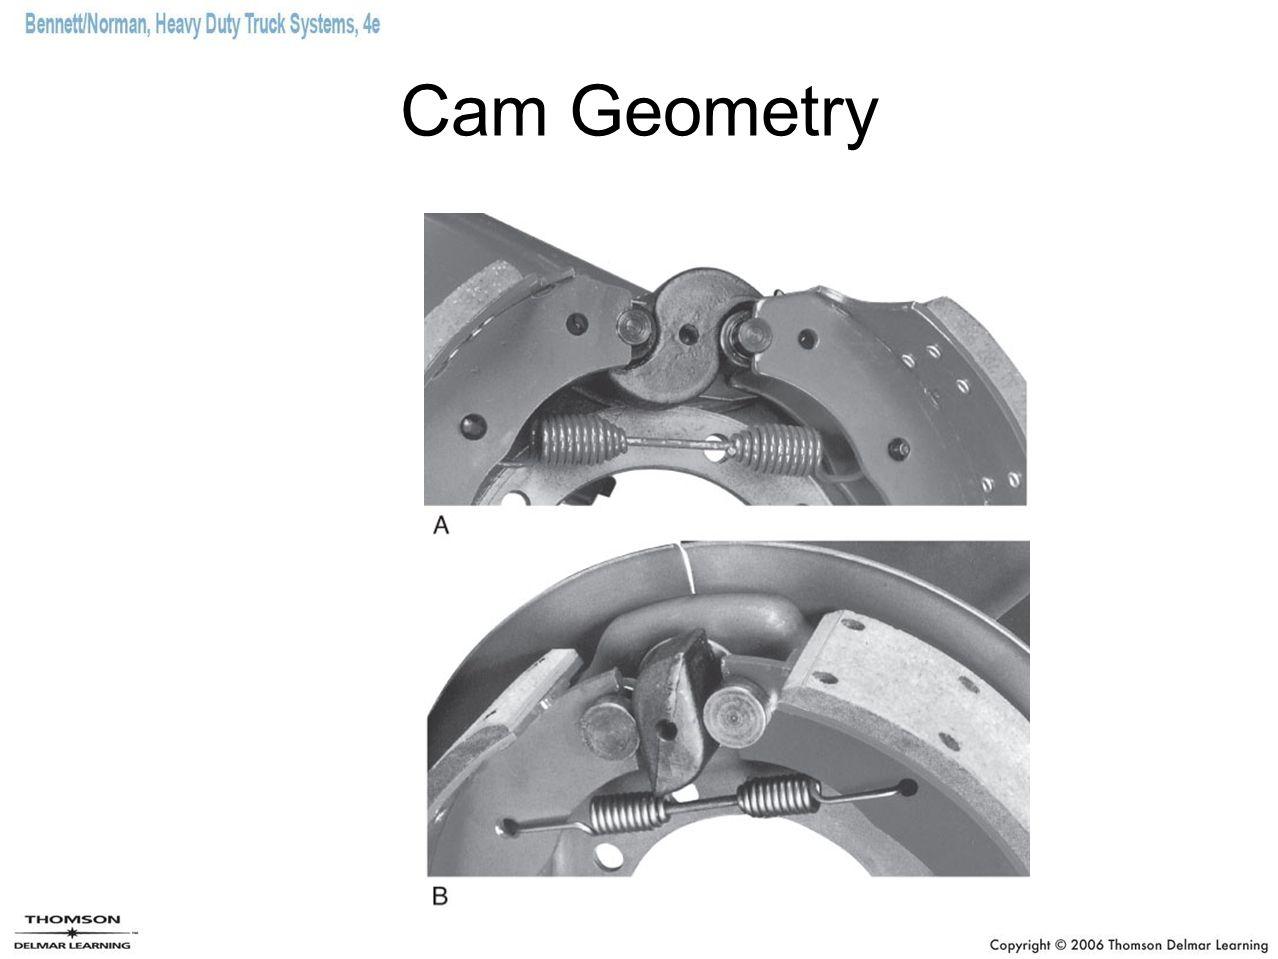 Cam Geometry